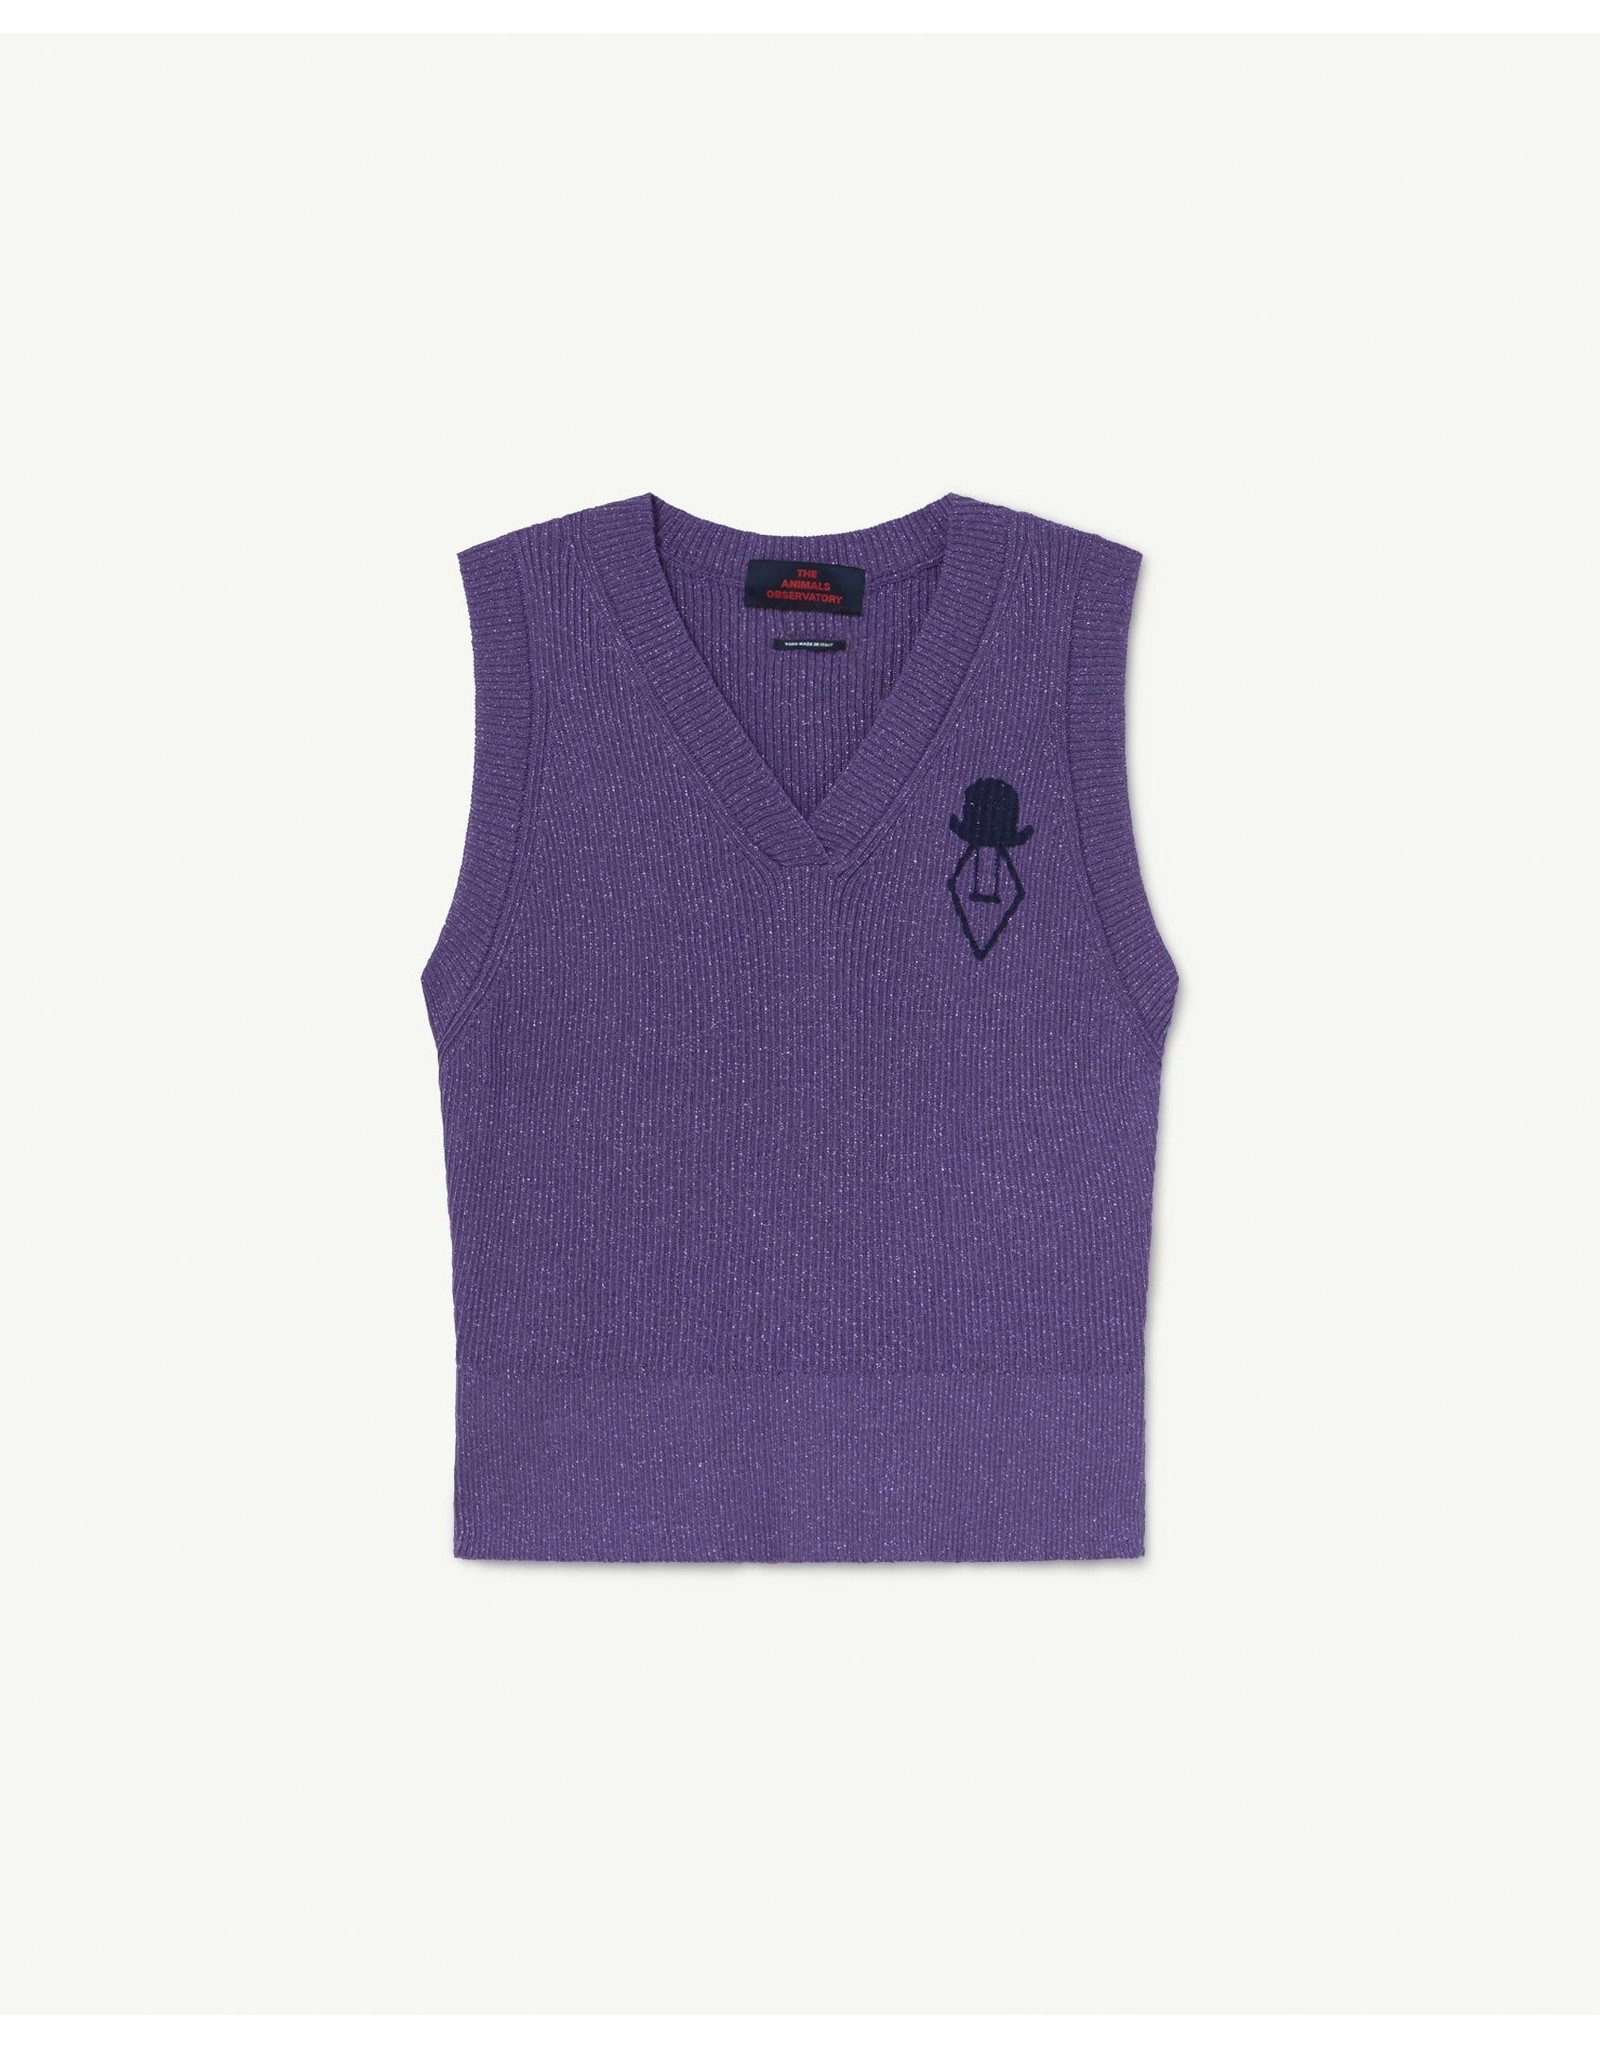 TAO SS21089 Bat vest purple logo